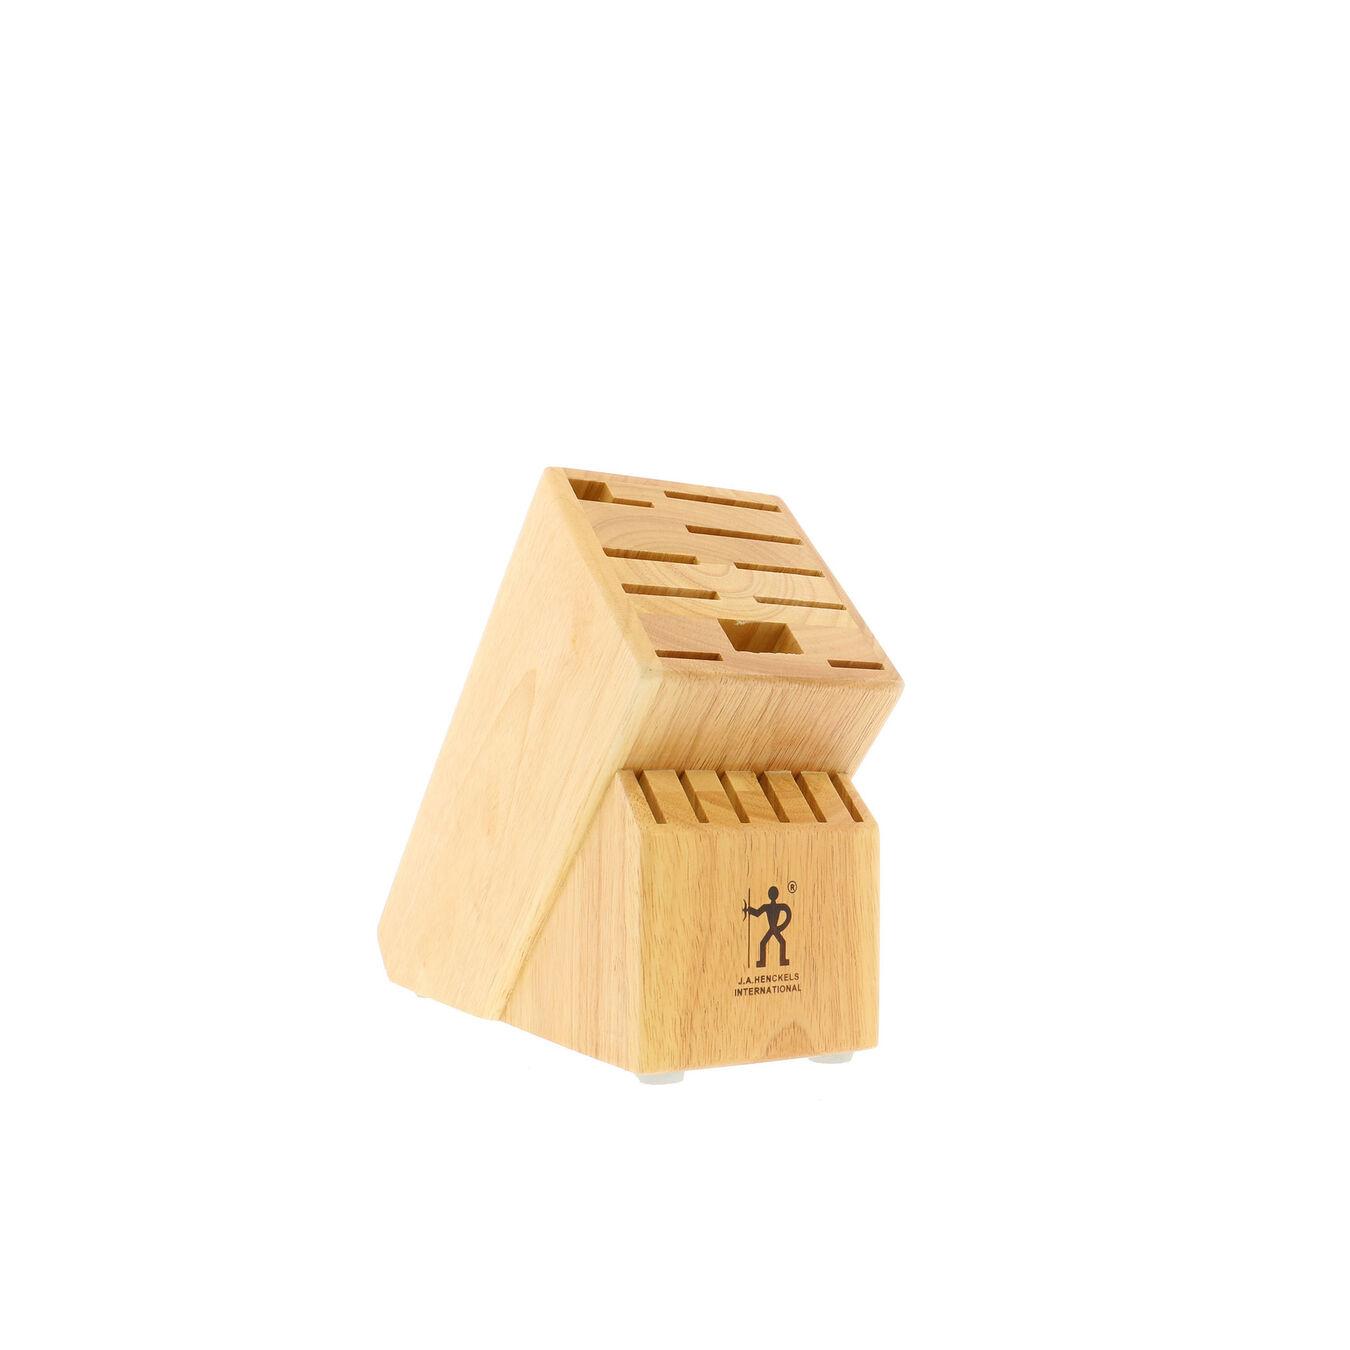 14-pc Knife Block Set,,large 2